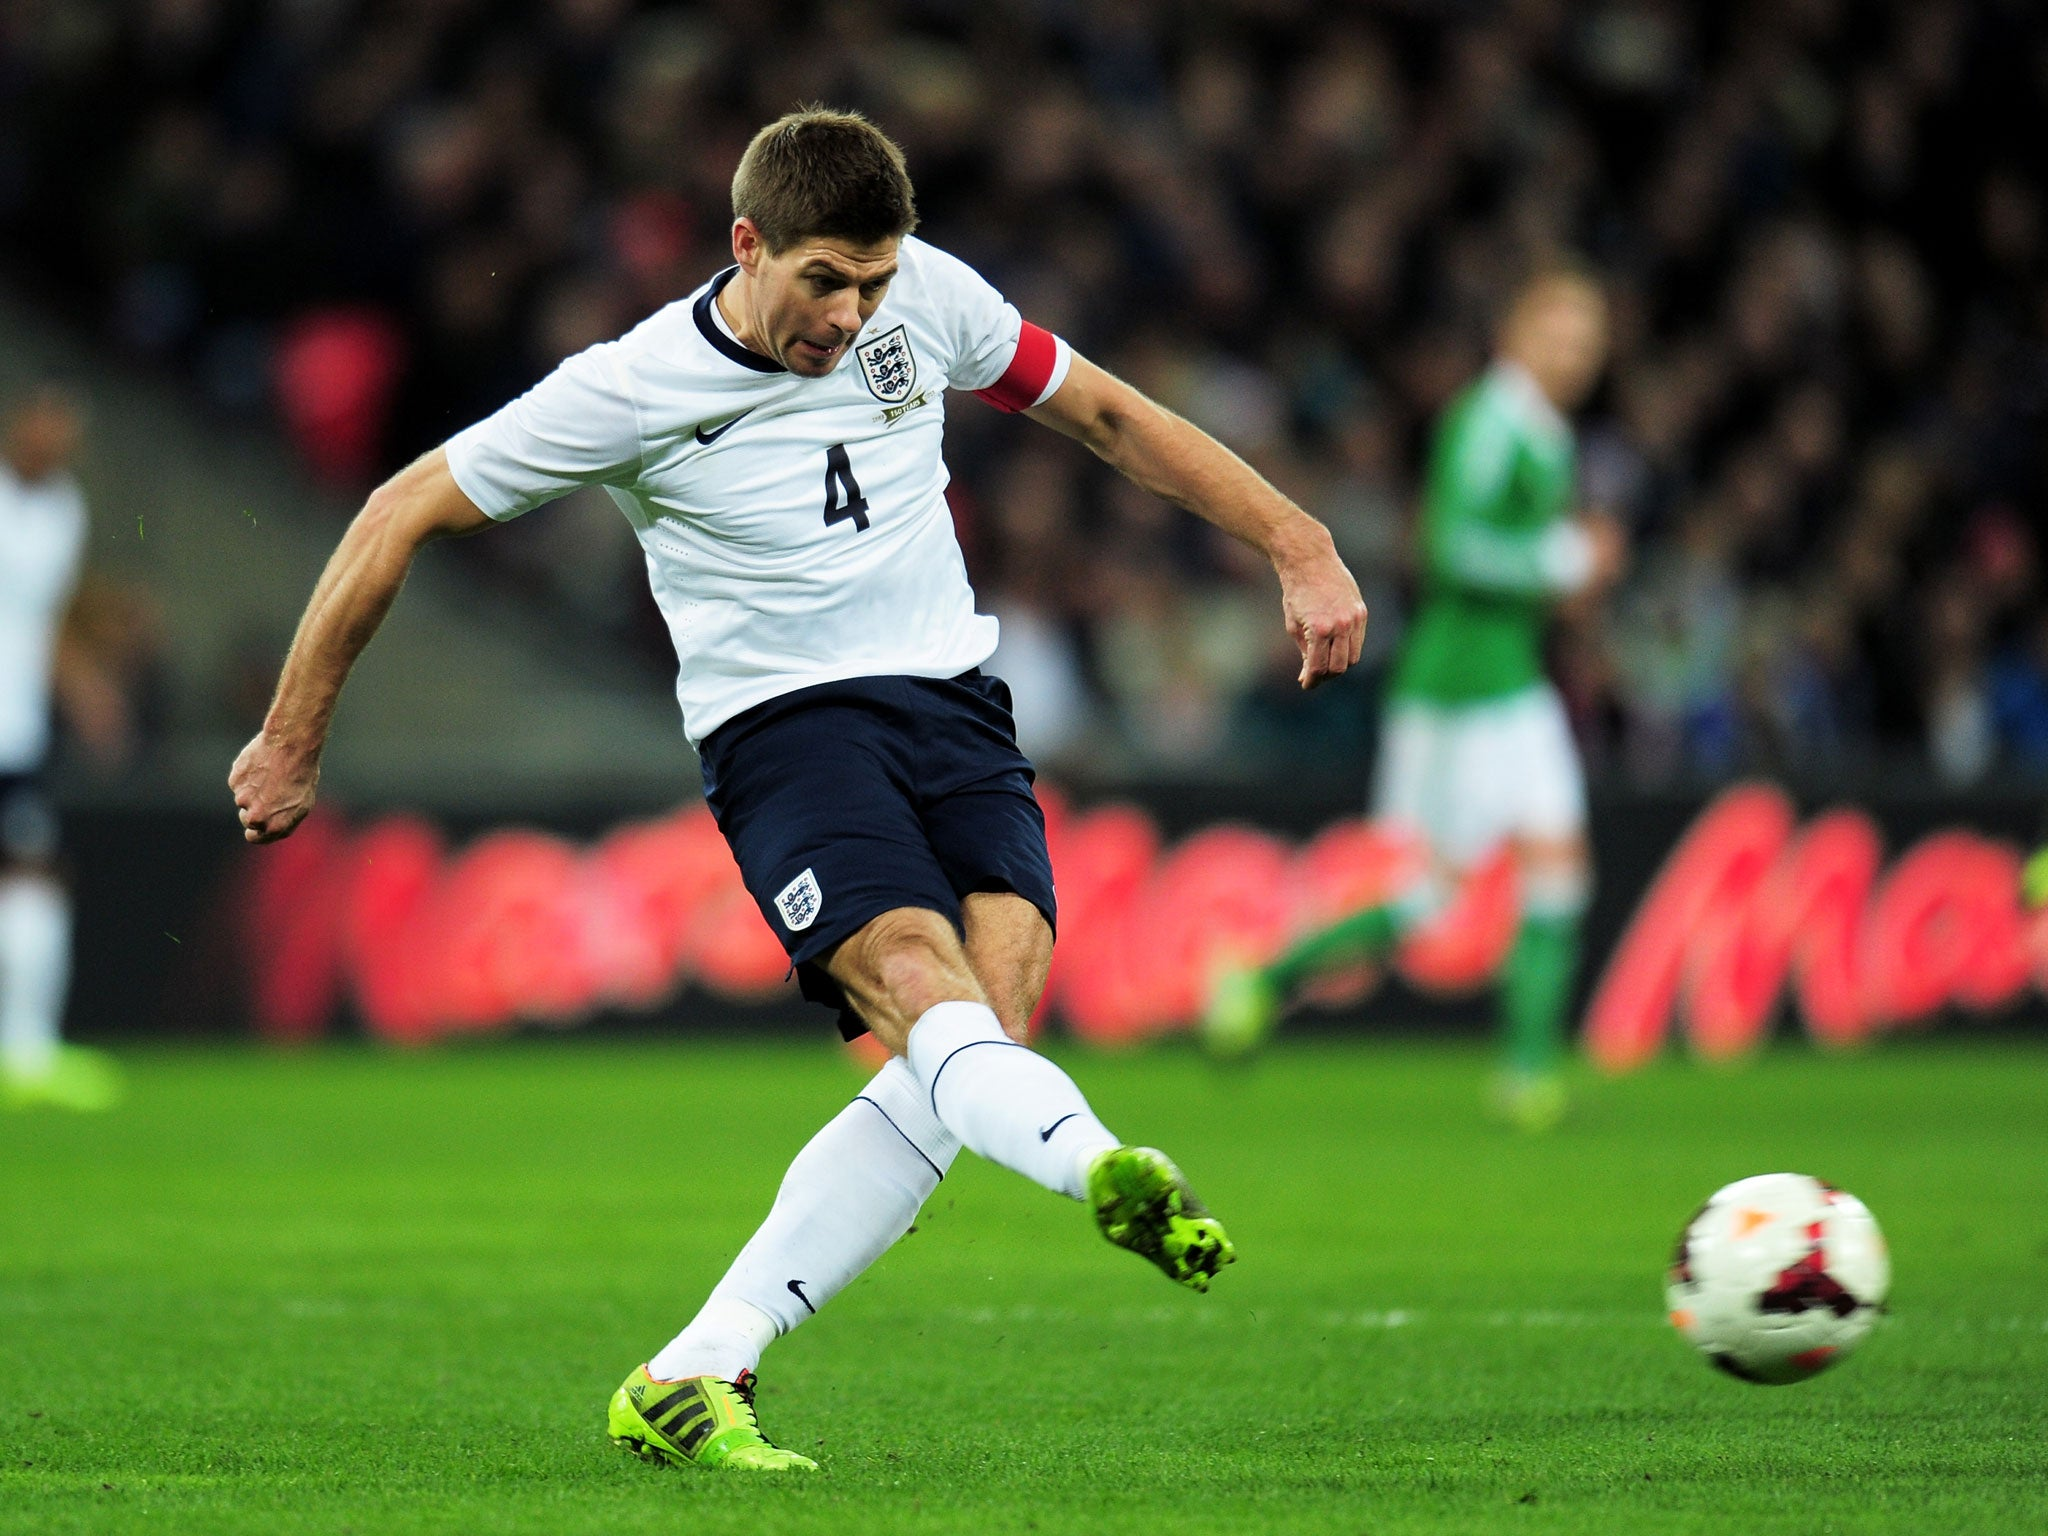 Steven Gerrard England future: Brendan Rodgers expects his ...